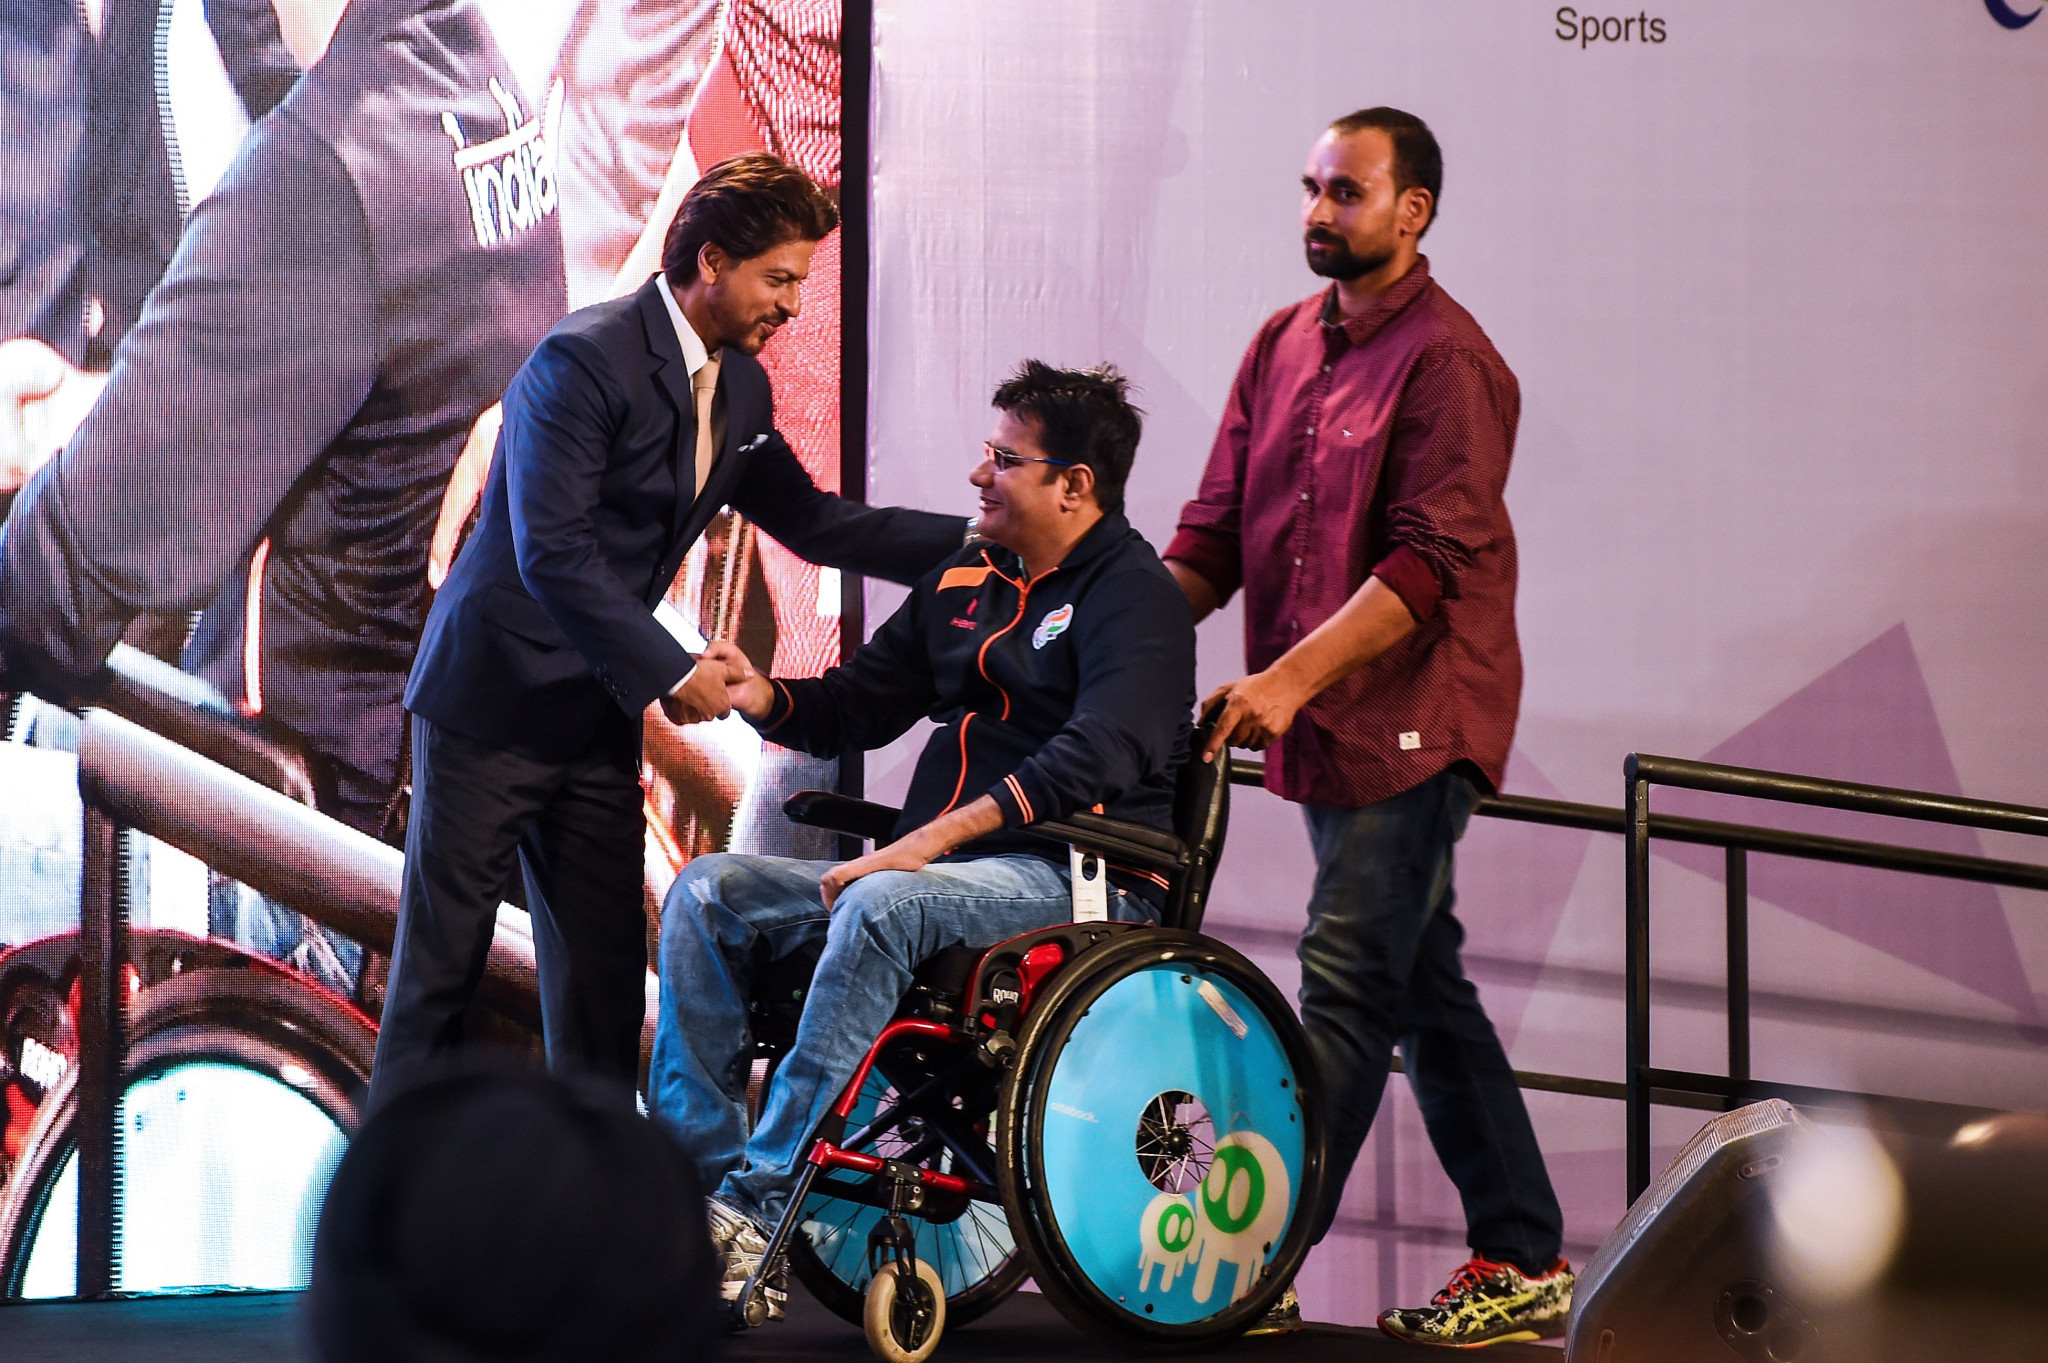 Club thrower Amit Saroha said athletes paid to help release Ramesh Tikaram's body to his family ©Getty Images